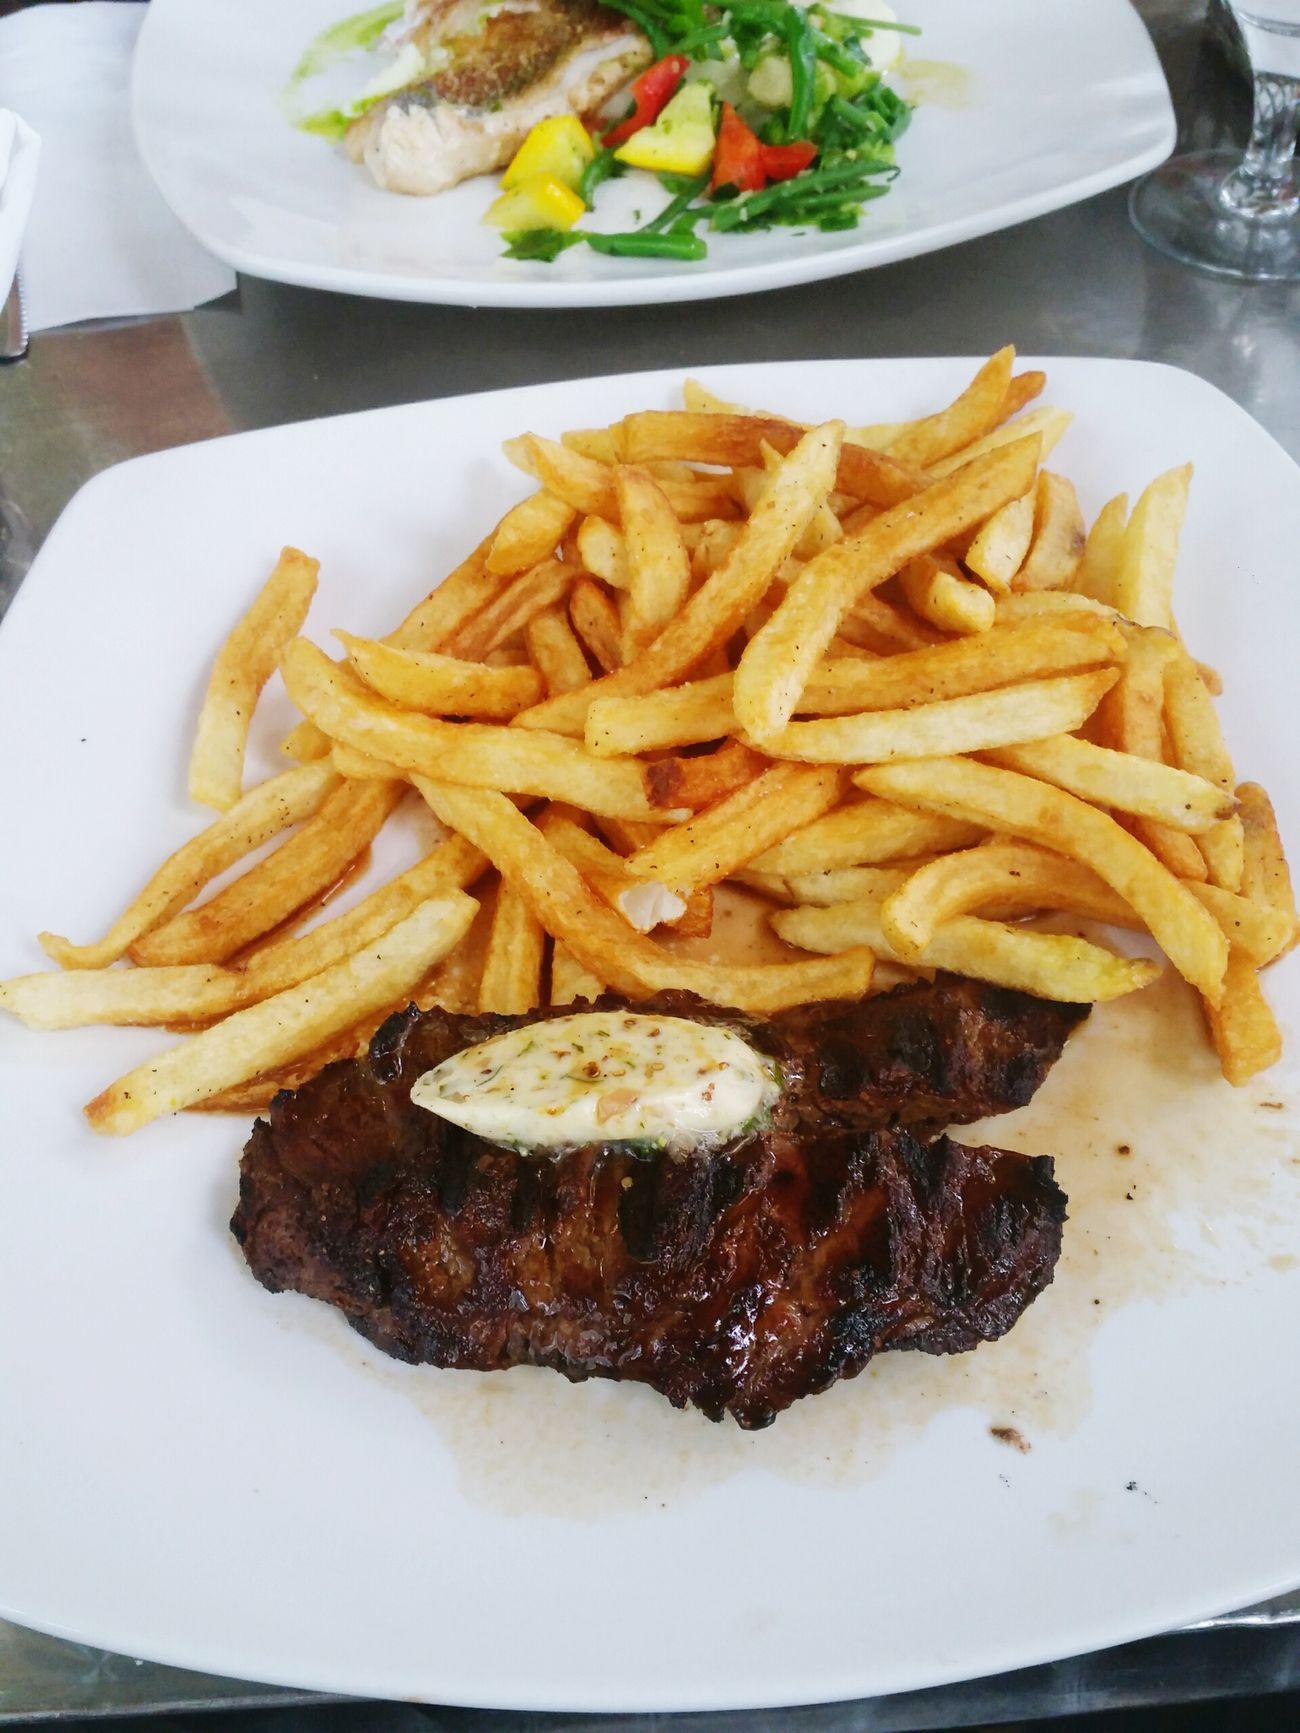 Good Food Dinner Dinner Time Bossmoves Montreal, Canada